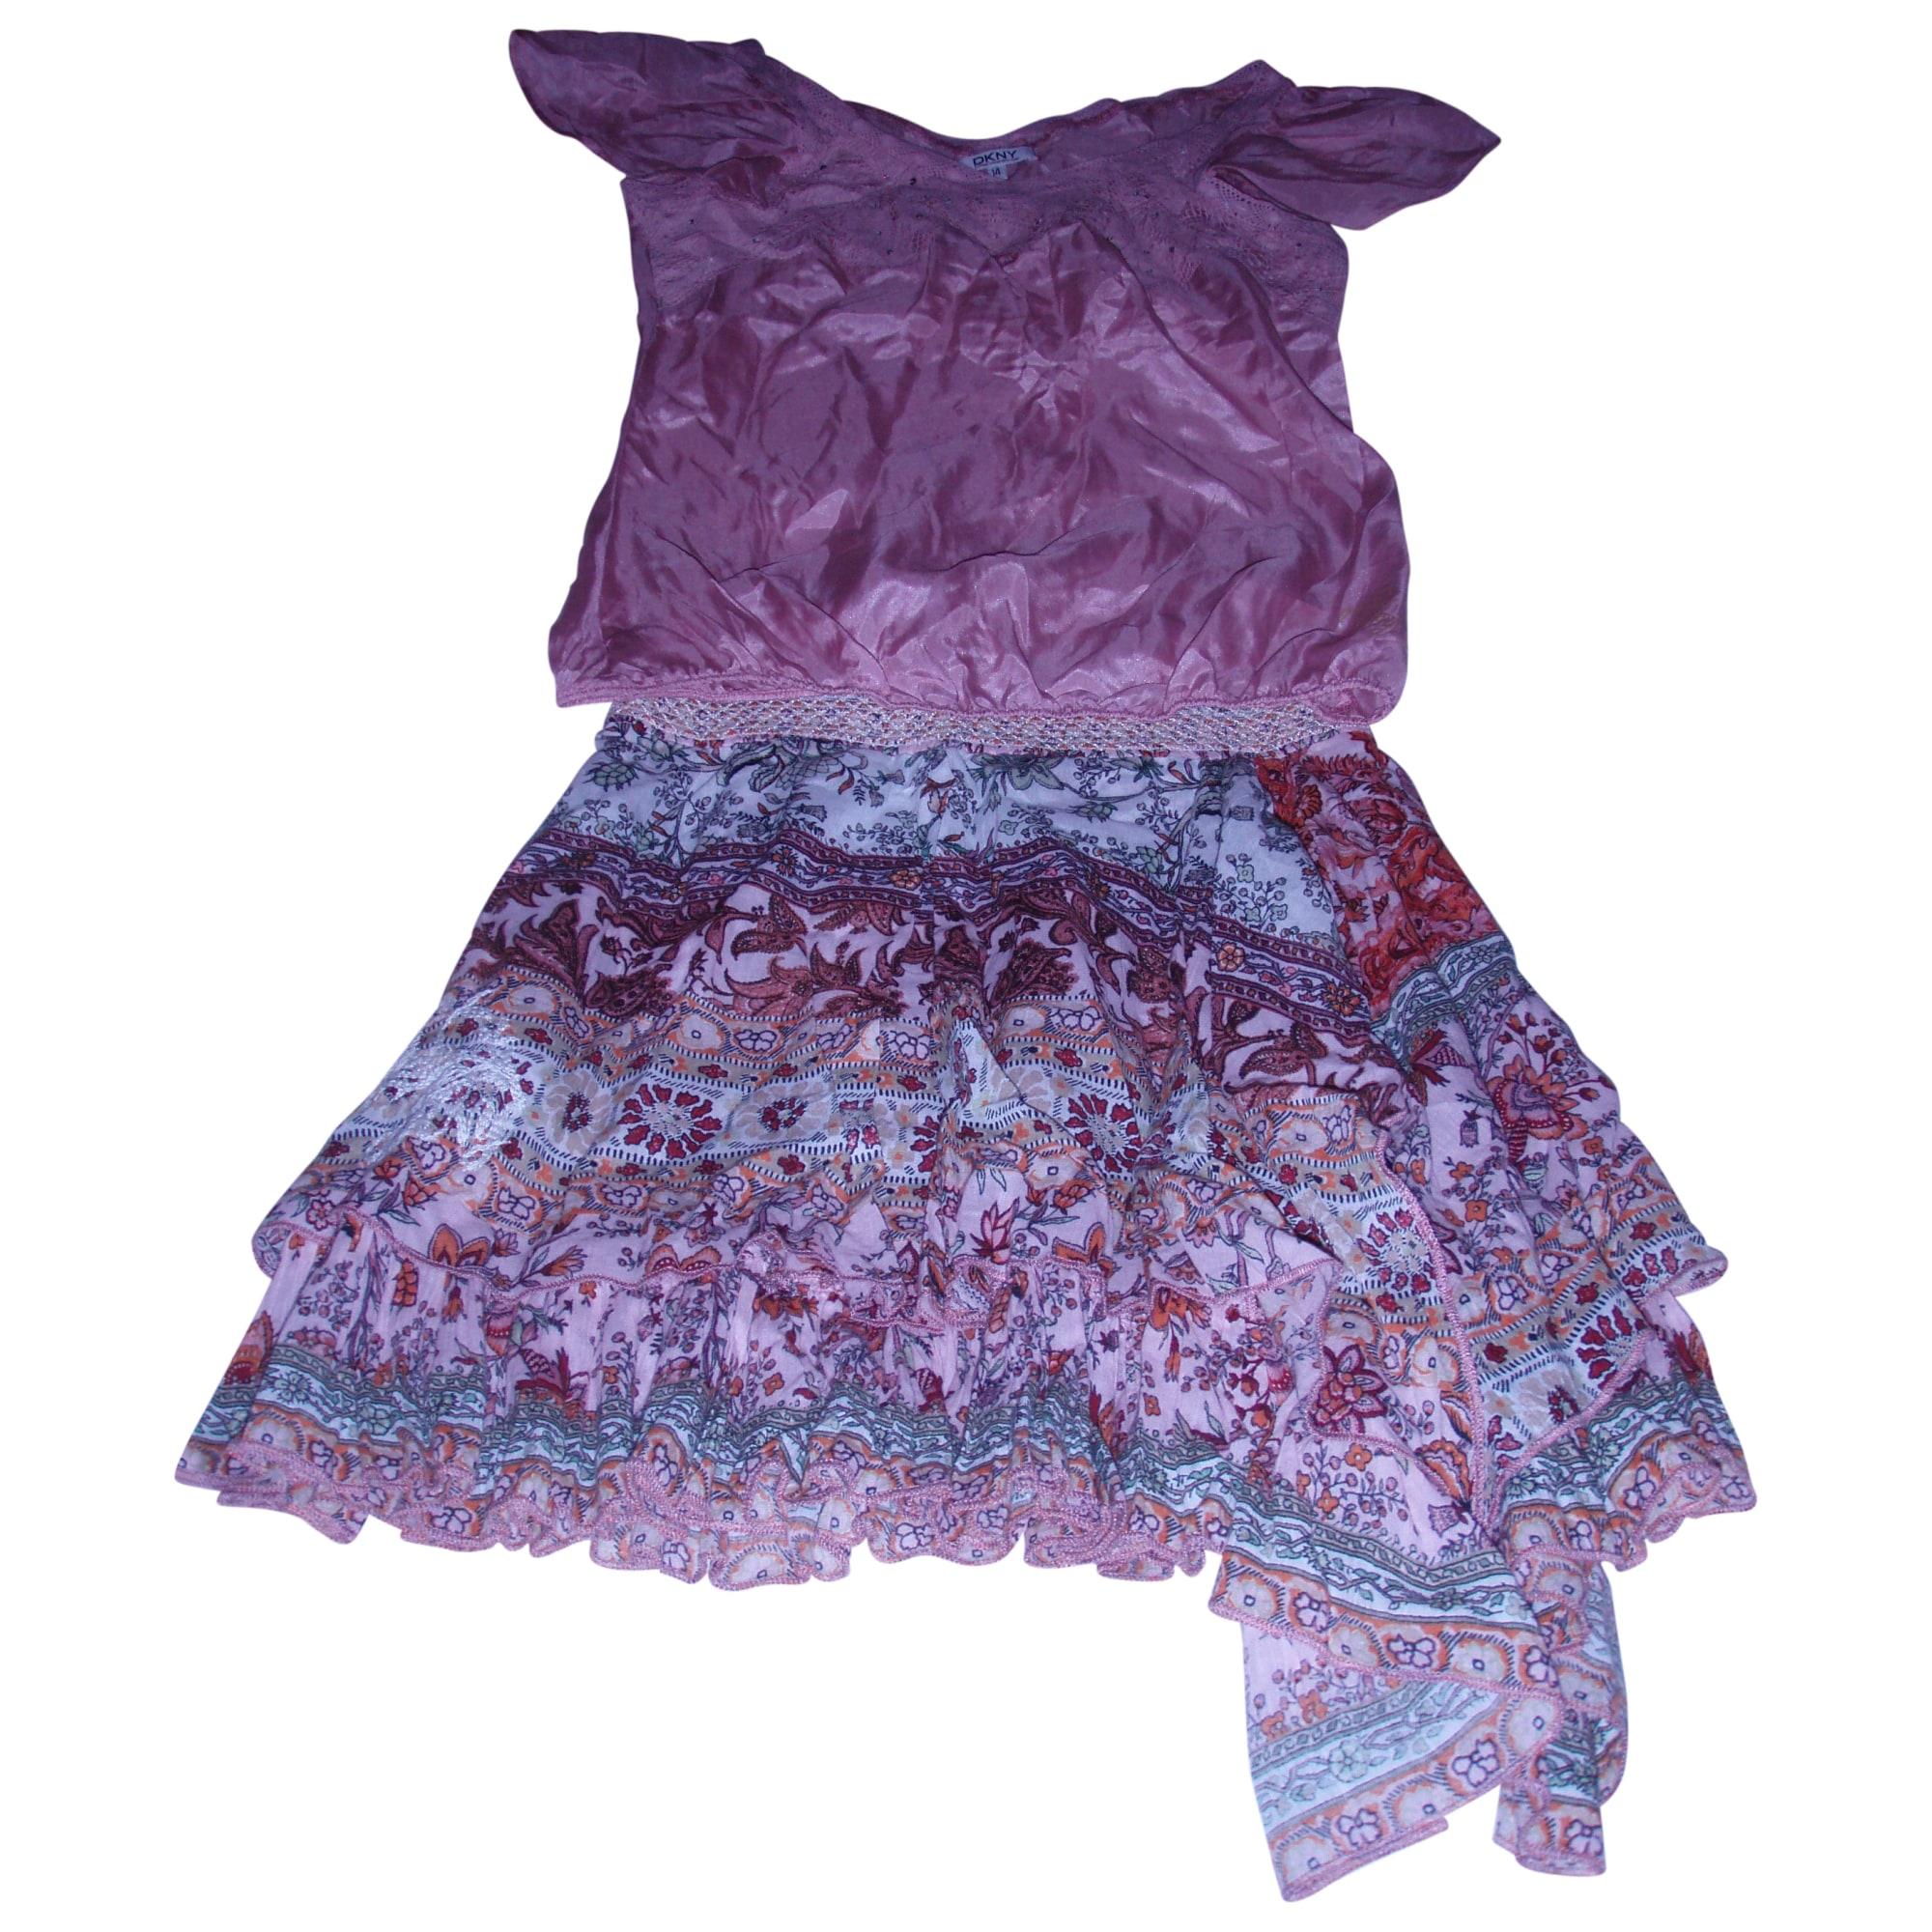 Anzug, Set für Kinder, kurz DKNY Pink,  altrosa